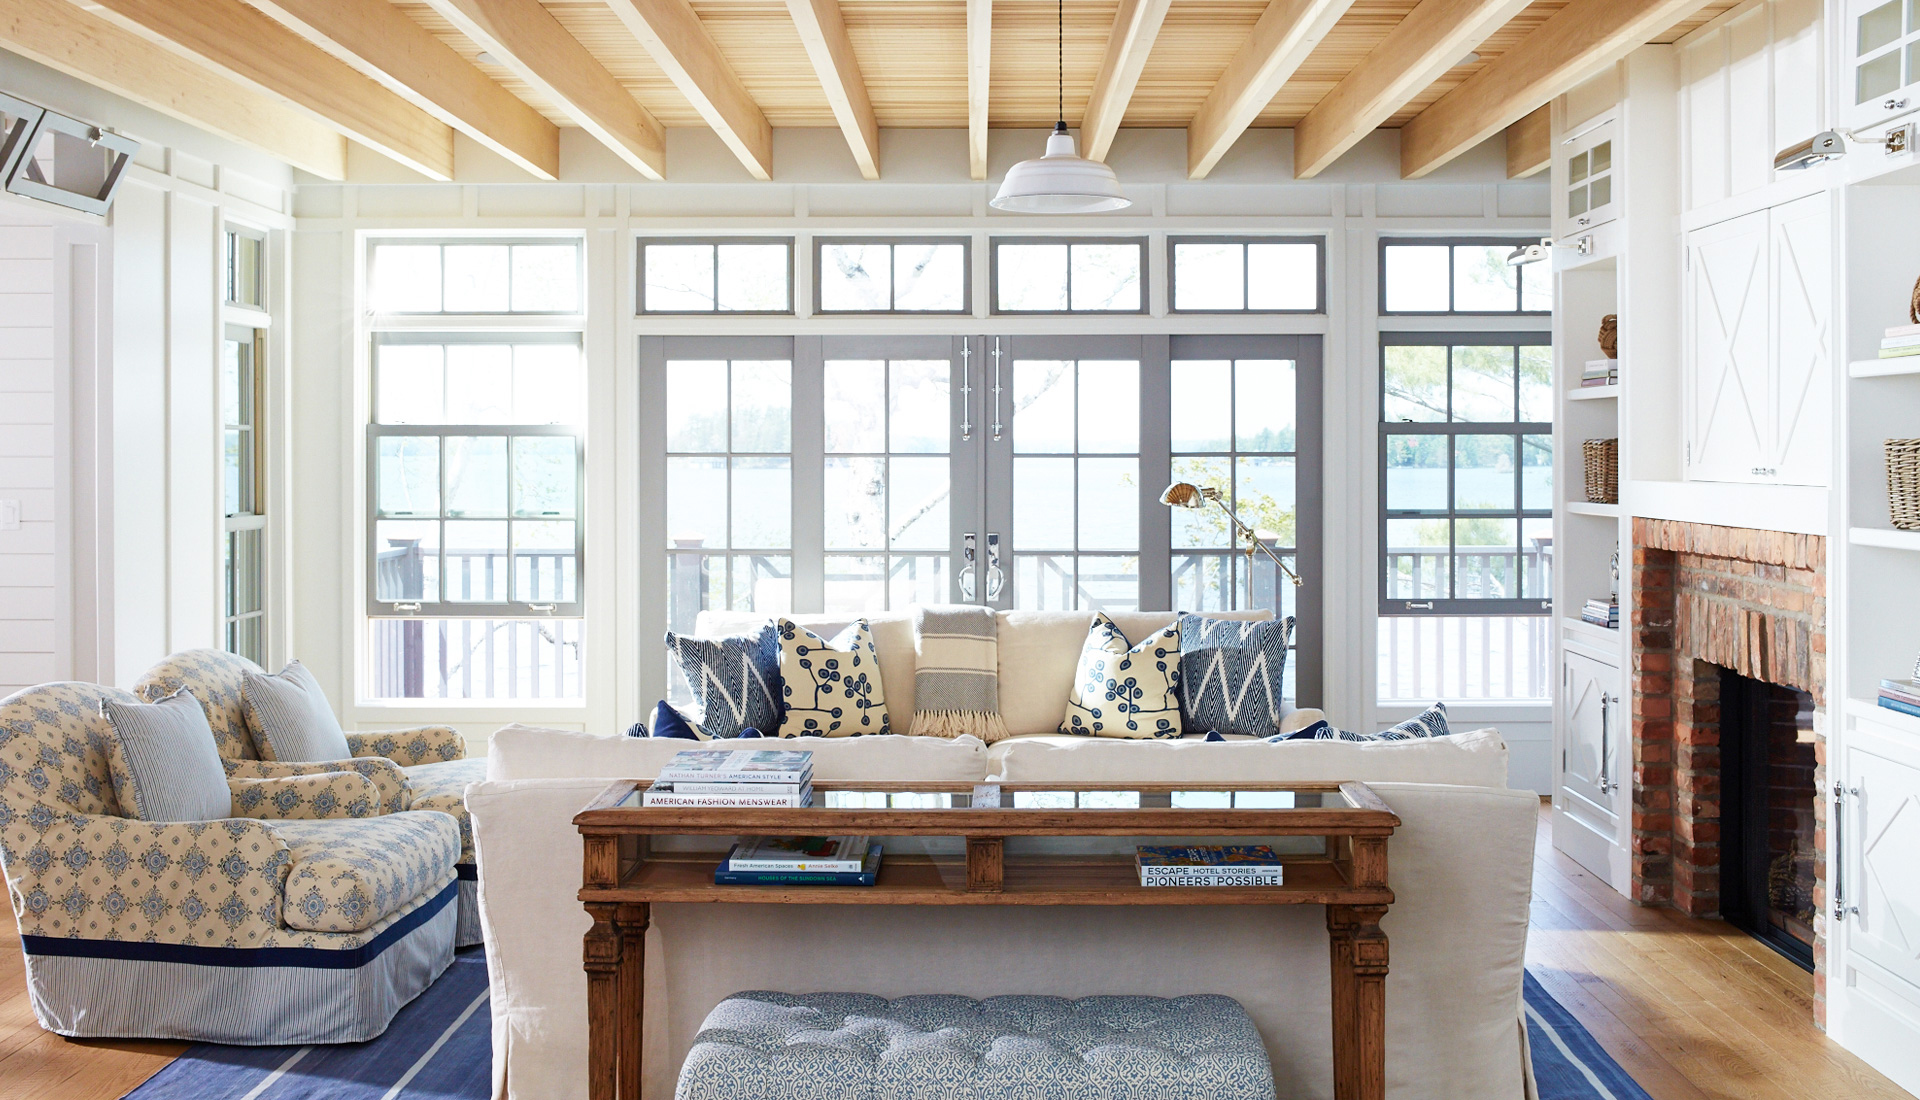 seaside interior design ideas | Billingsblessingbags.org